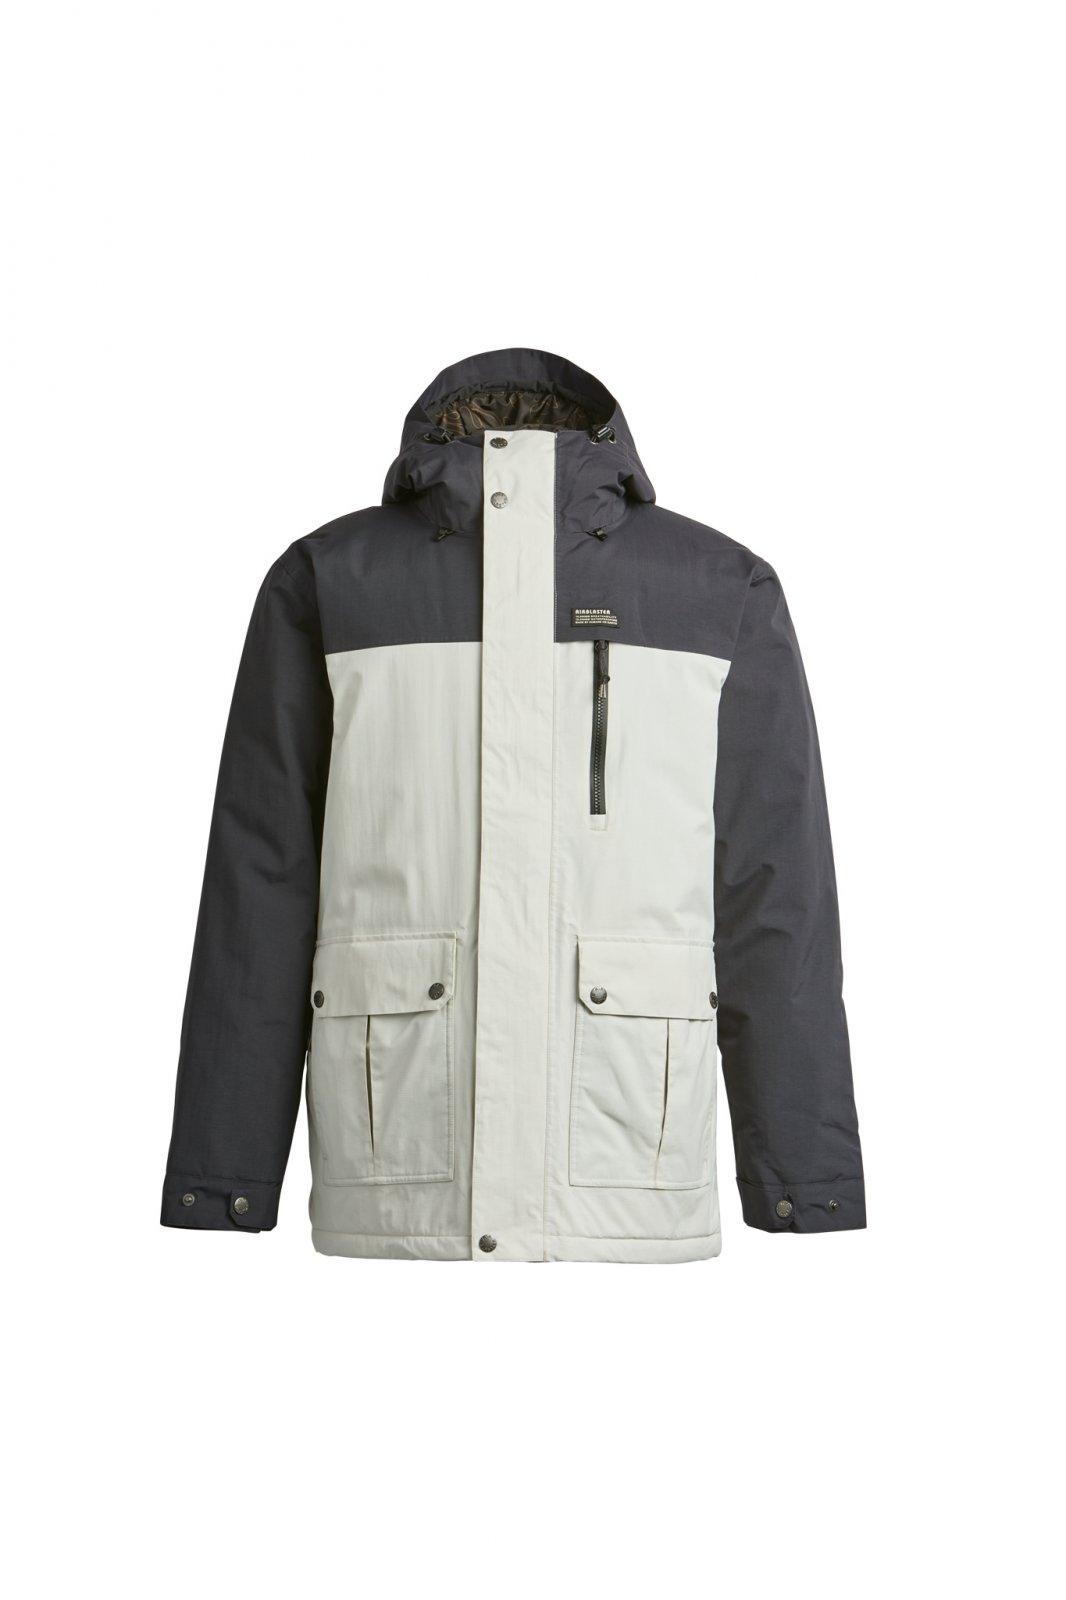 Airblaster Grampy 3000 Jacket (Multiple Color Options)